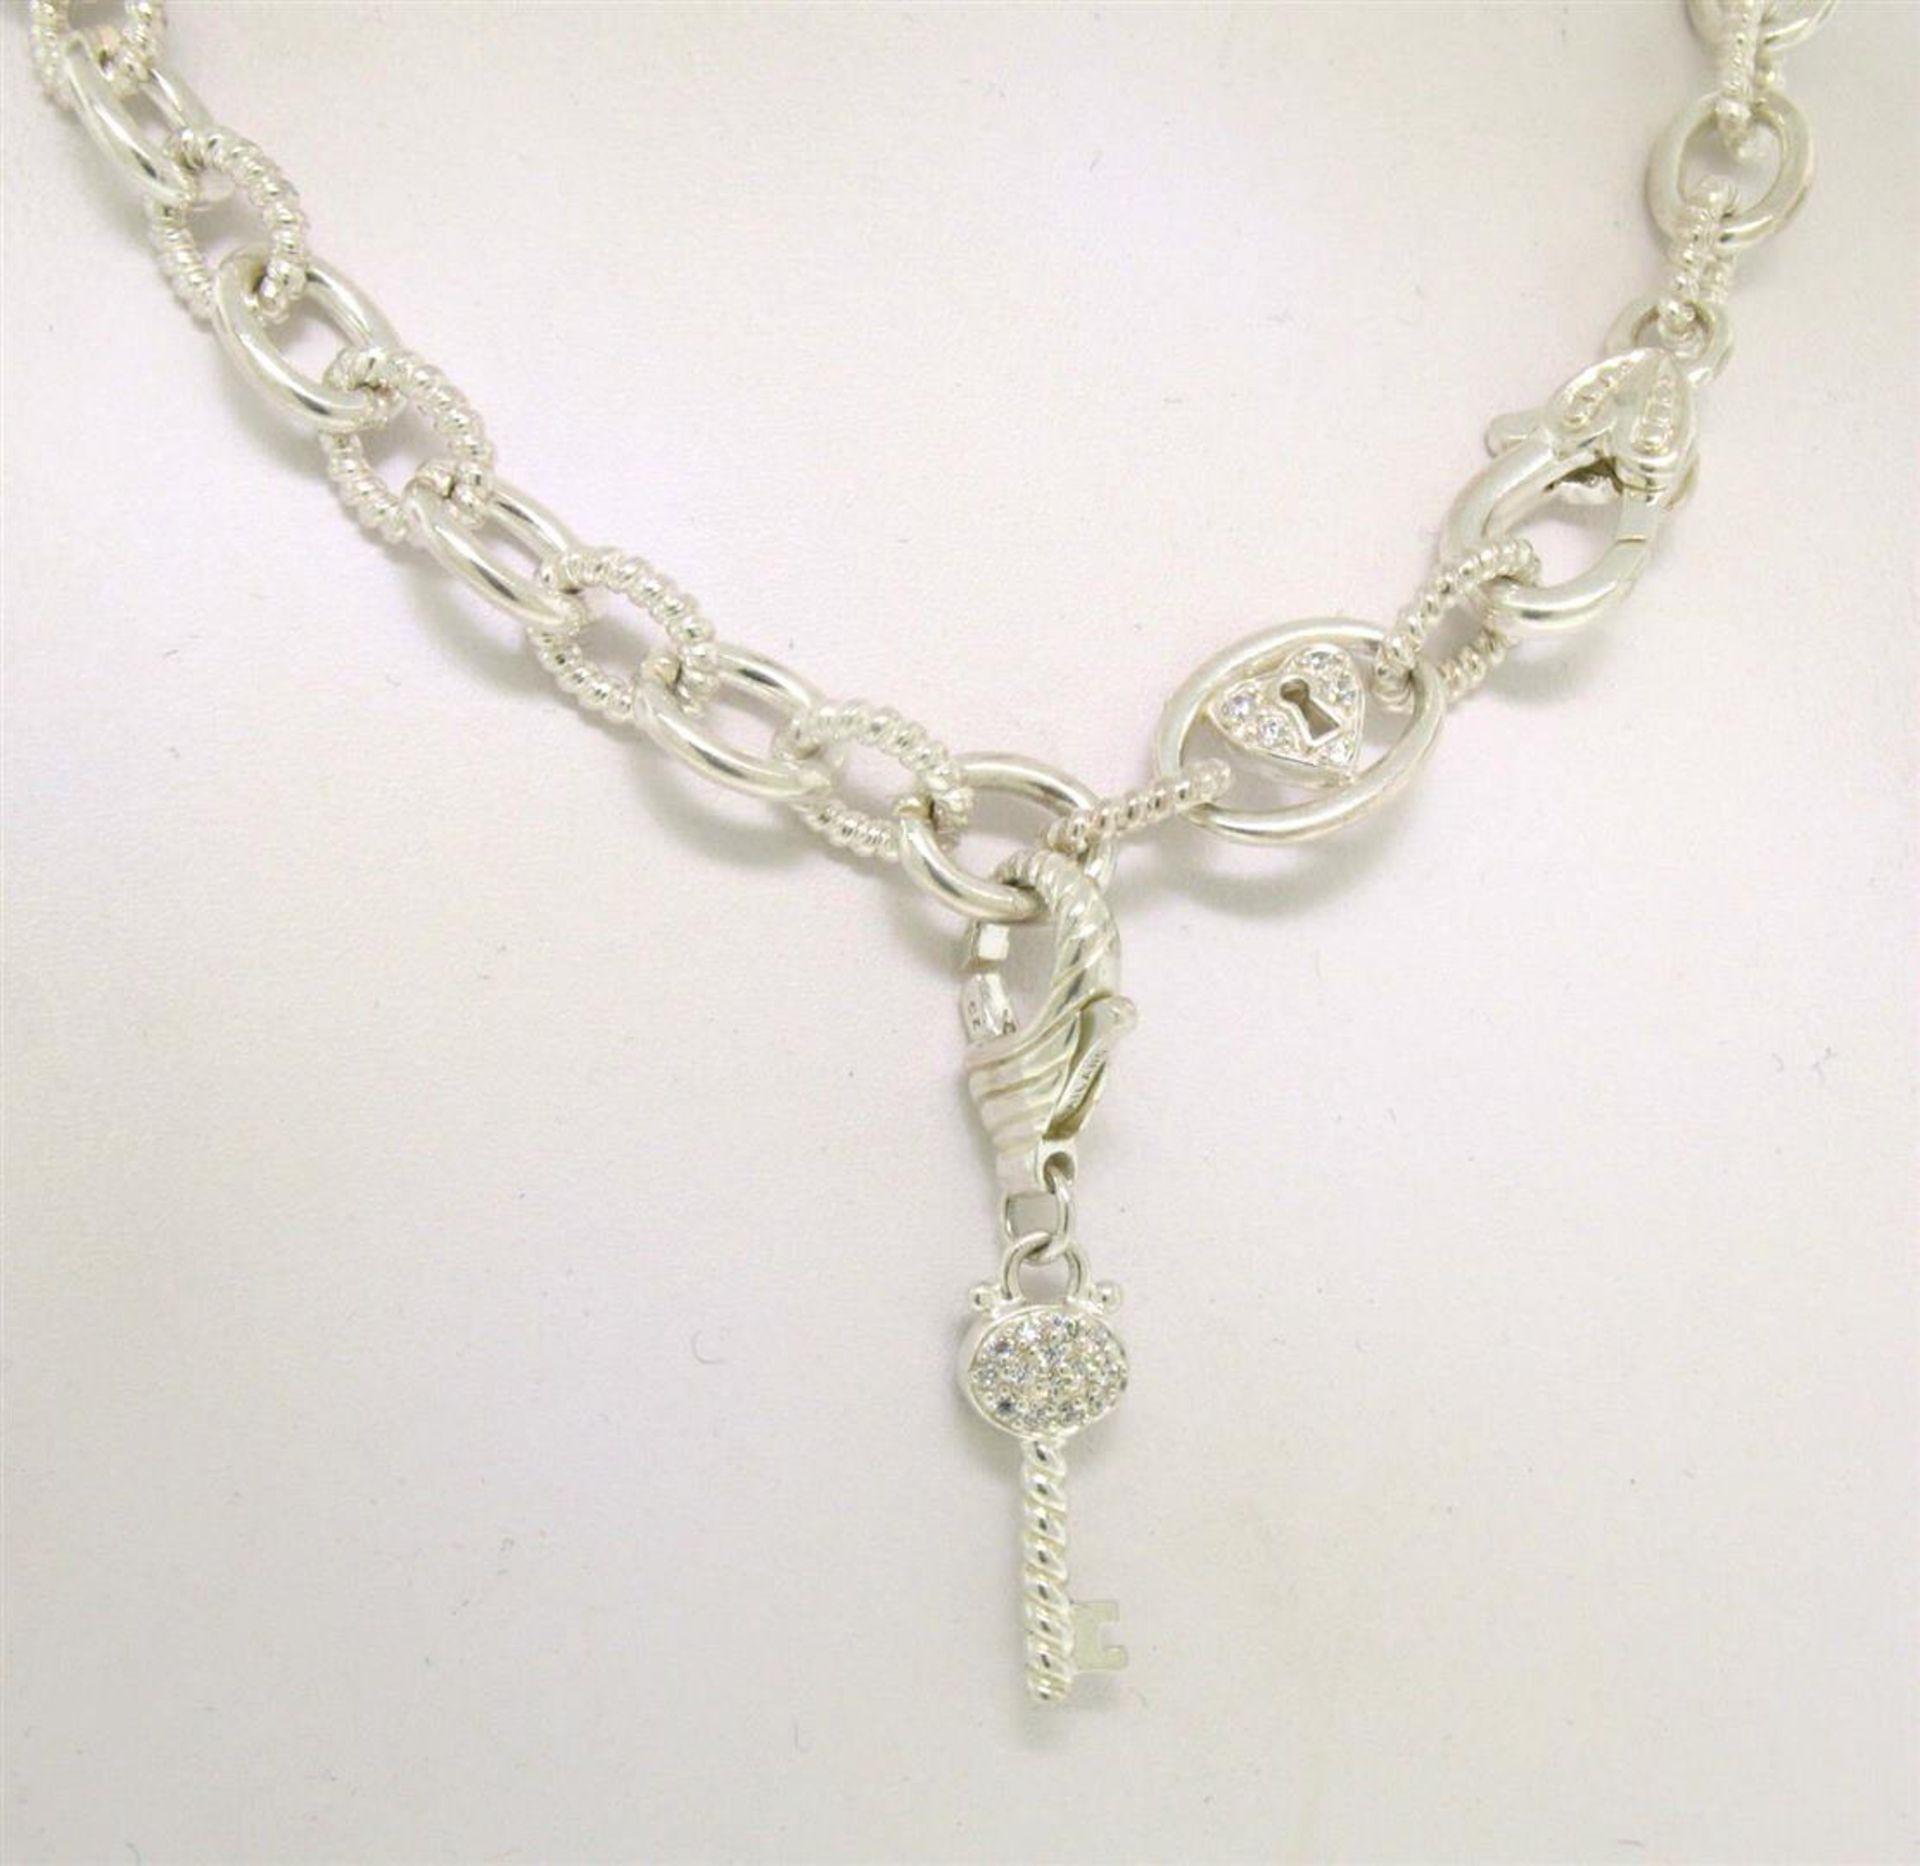 Elaborate JUDITH RIPKA Solid .925 Sterling Silver Chain w/ Diamonique Key Enhanc - Image 2 of 3